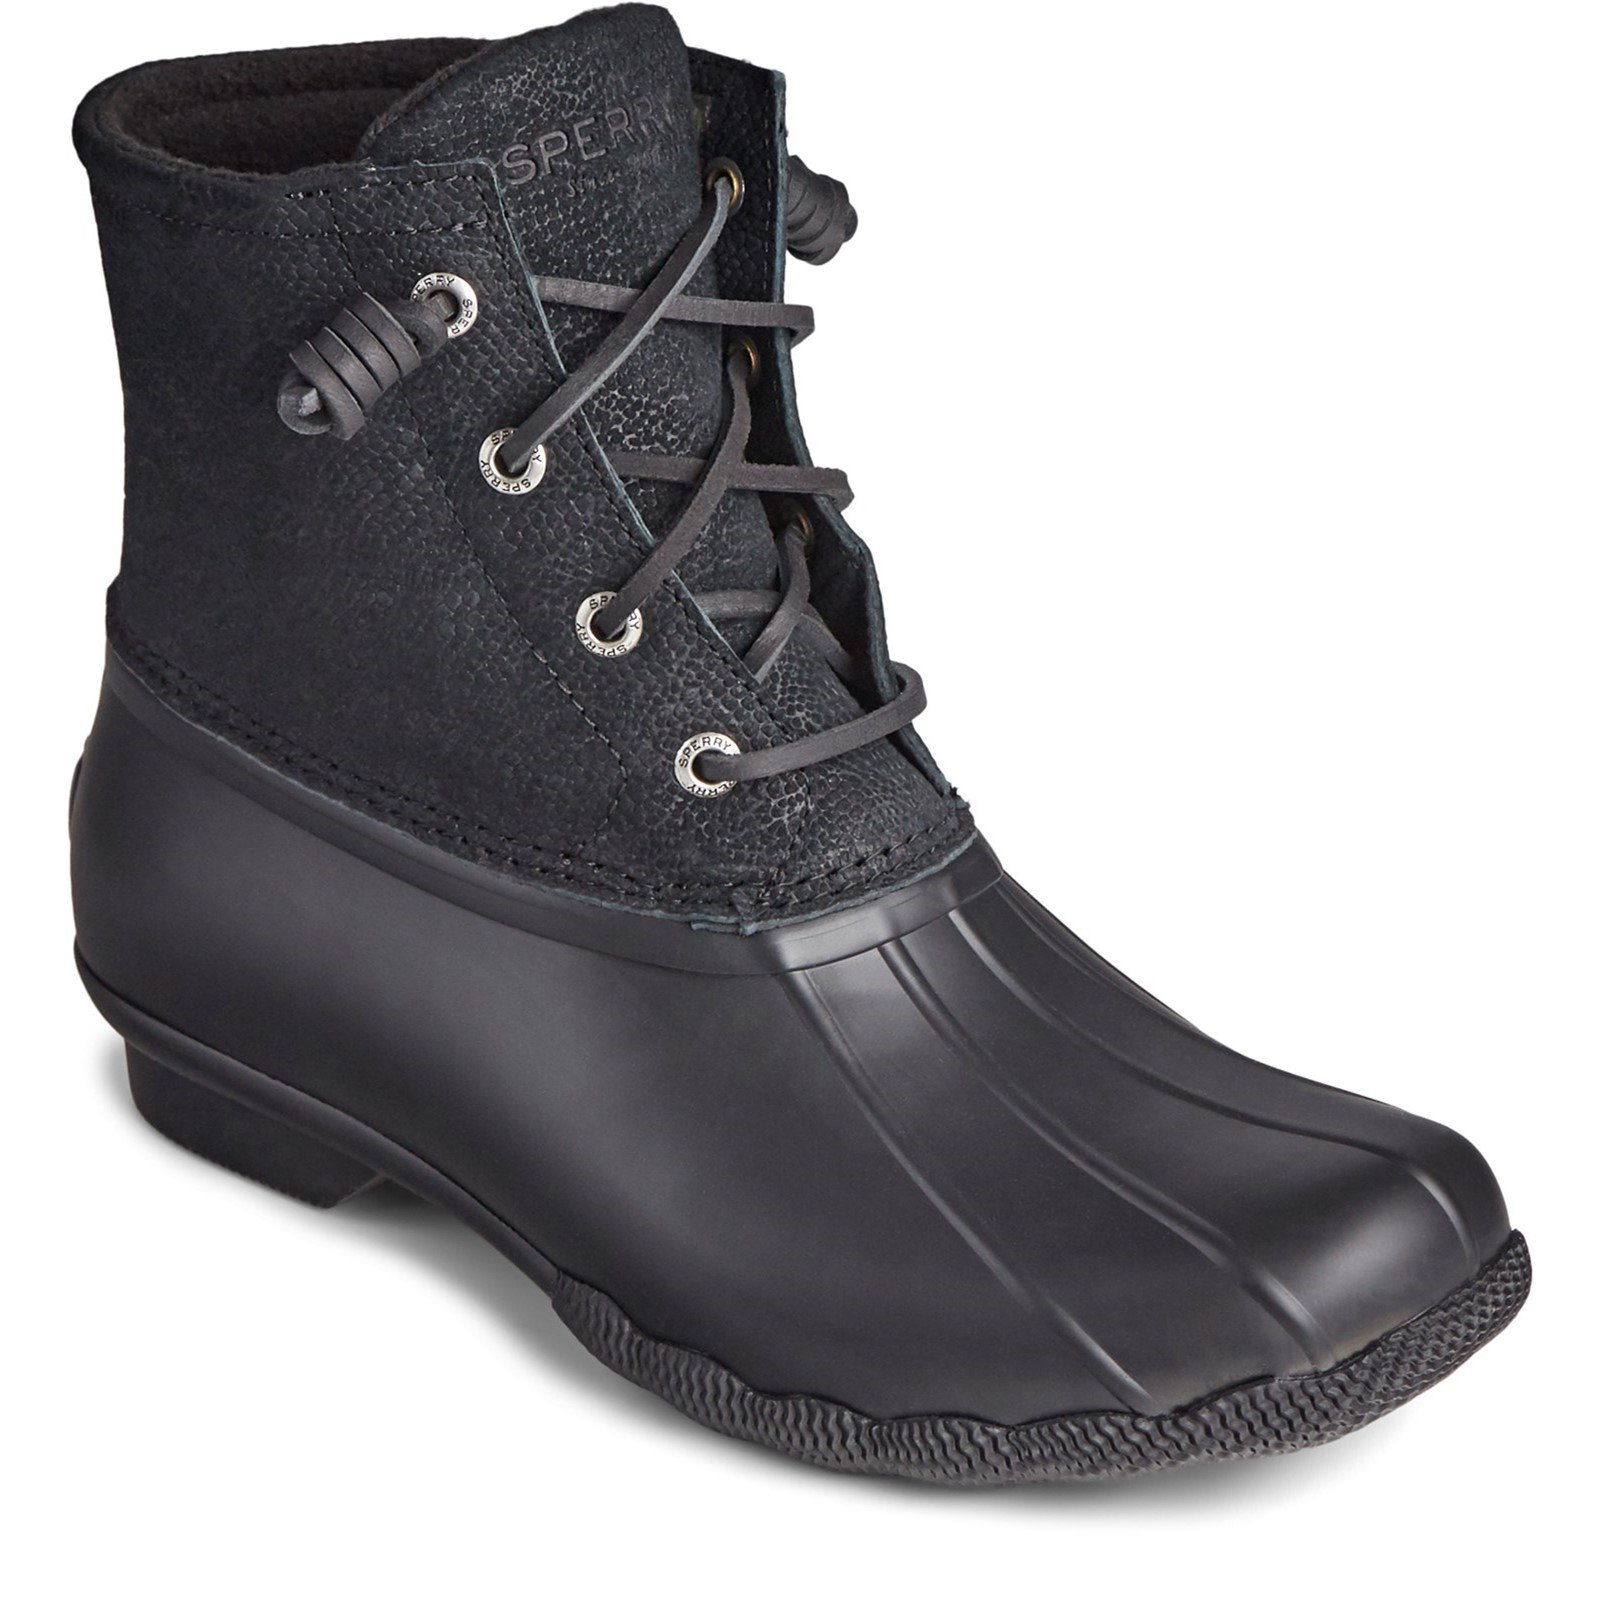 Sperry Women's Saltwater Mid Boot Black 32236 - Black 3